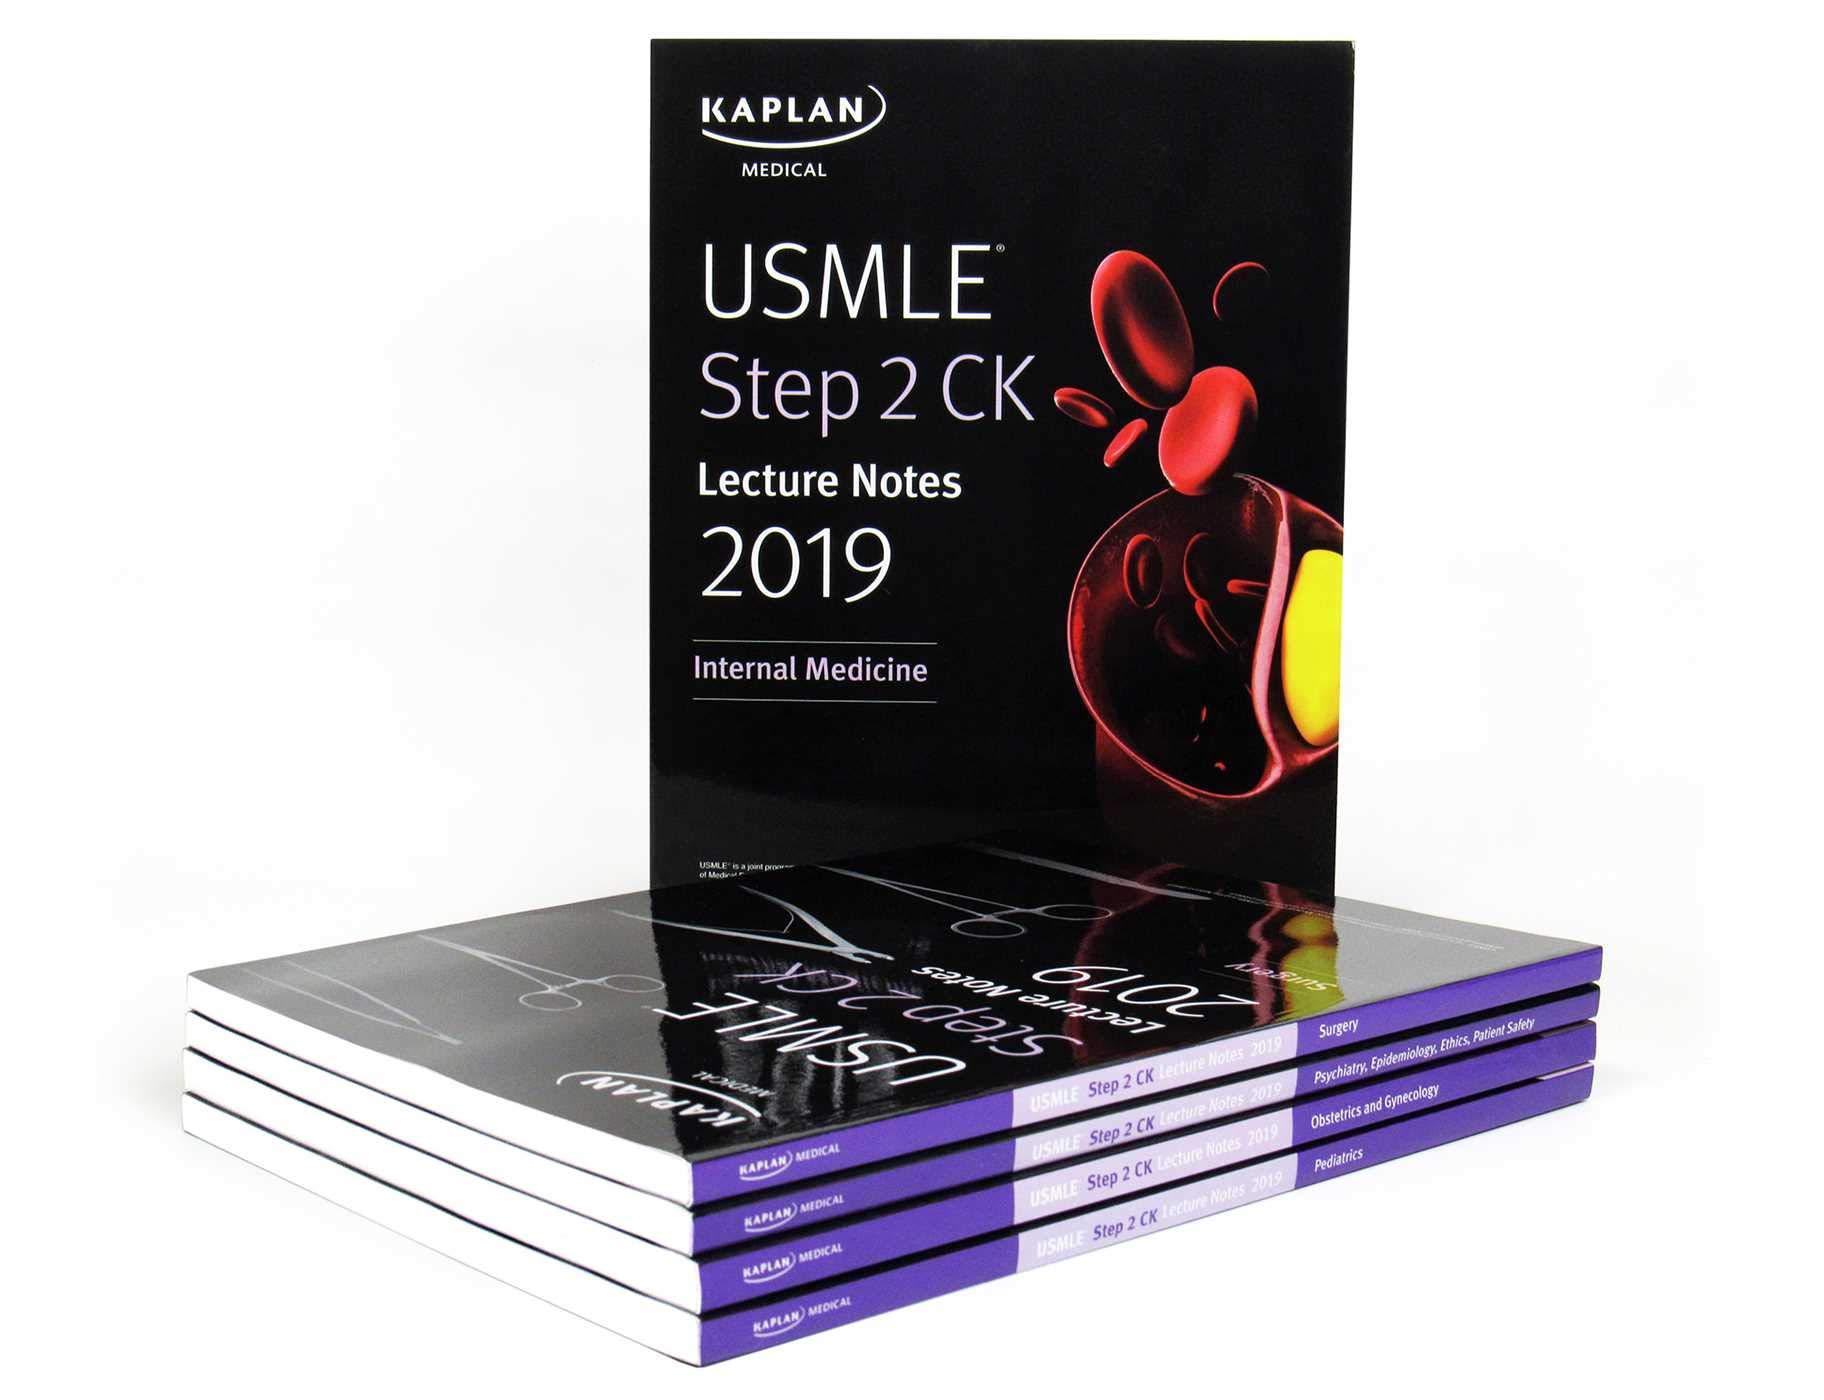 Buy USMLE Step 2 CK Lecture Notes 2019: 5-book set (Kaplan Test Prep